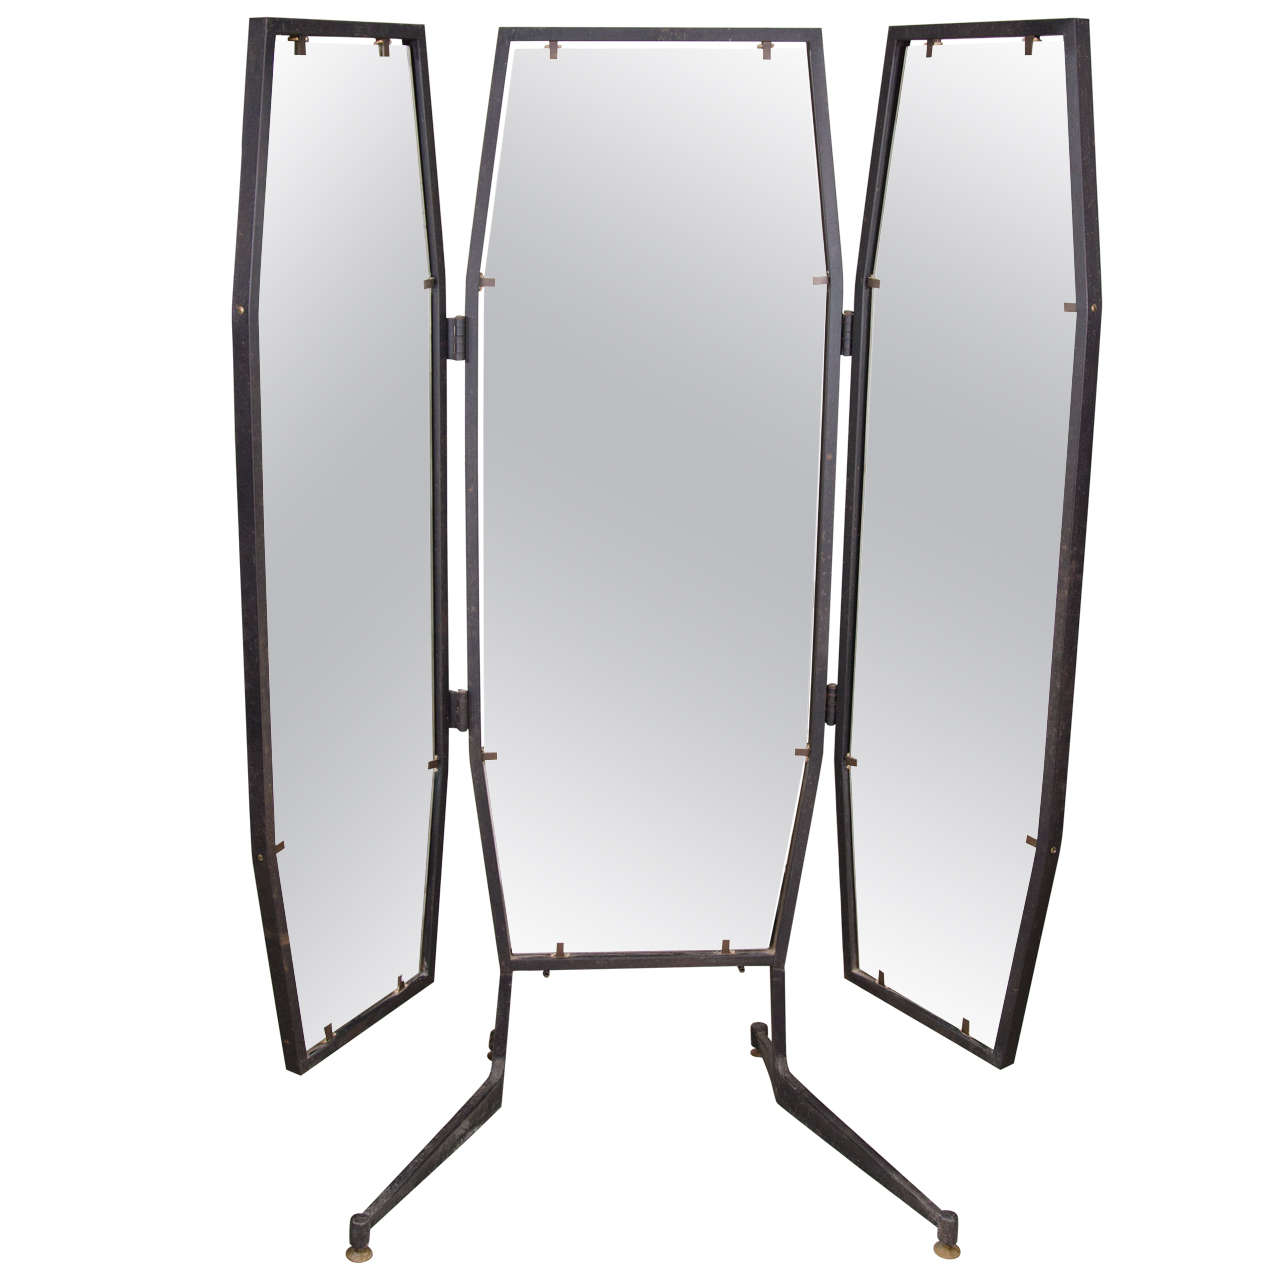 Full length three way italian mirror at 1stdibs for Cool full length mirror